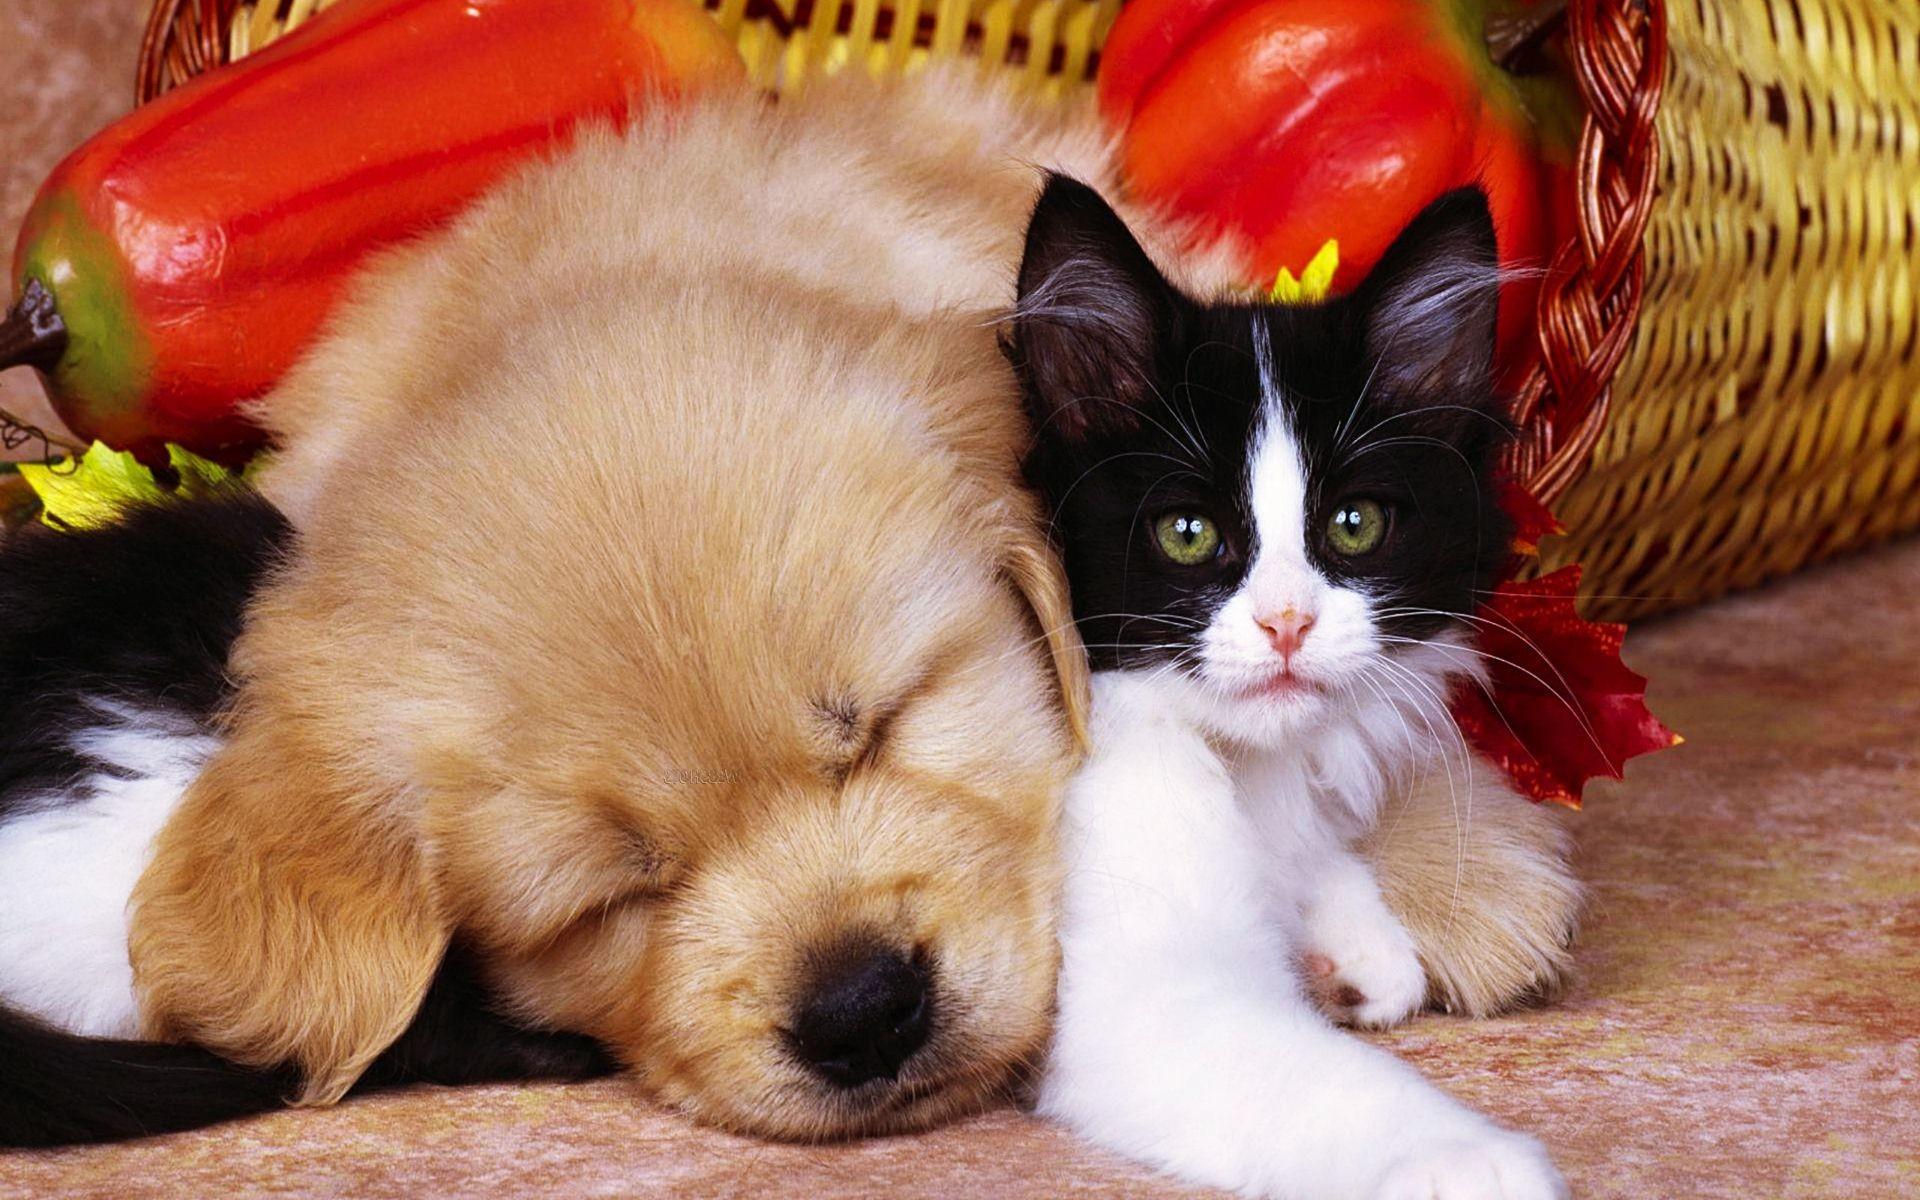 Pics Photos Free Download Pets Pic Cat And Dog Wallpaper